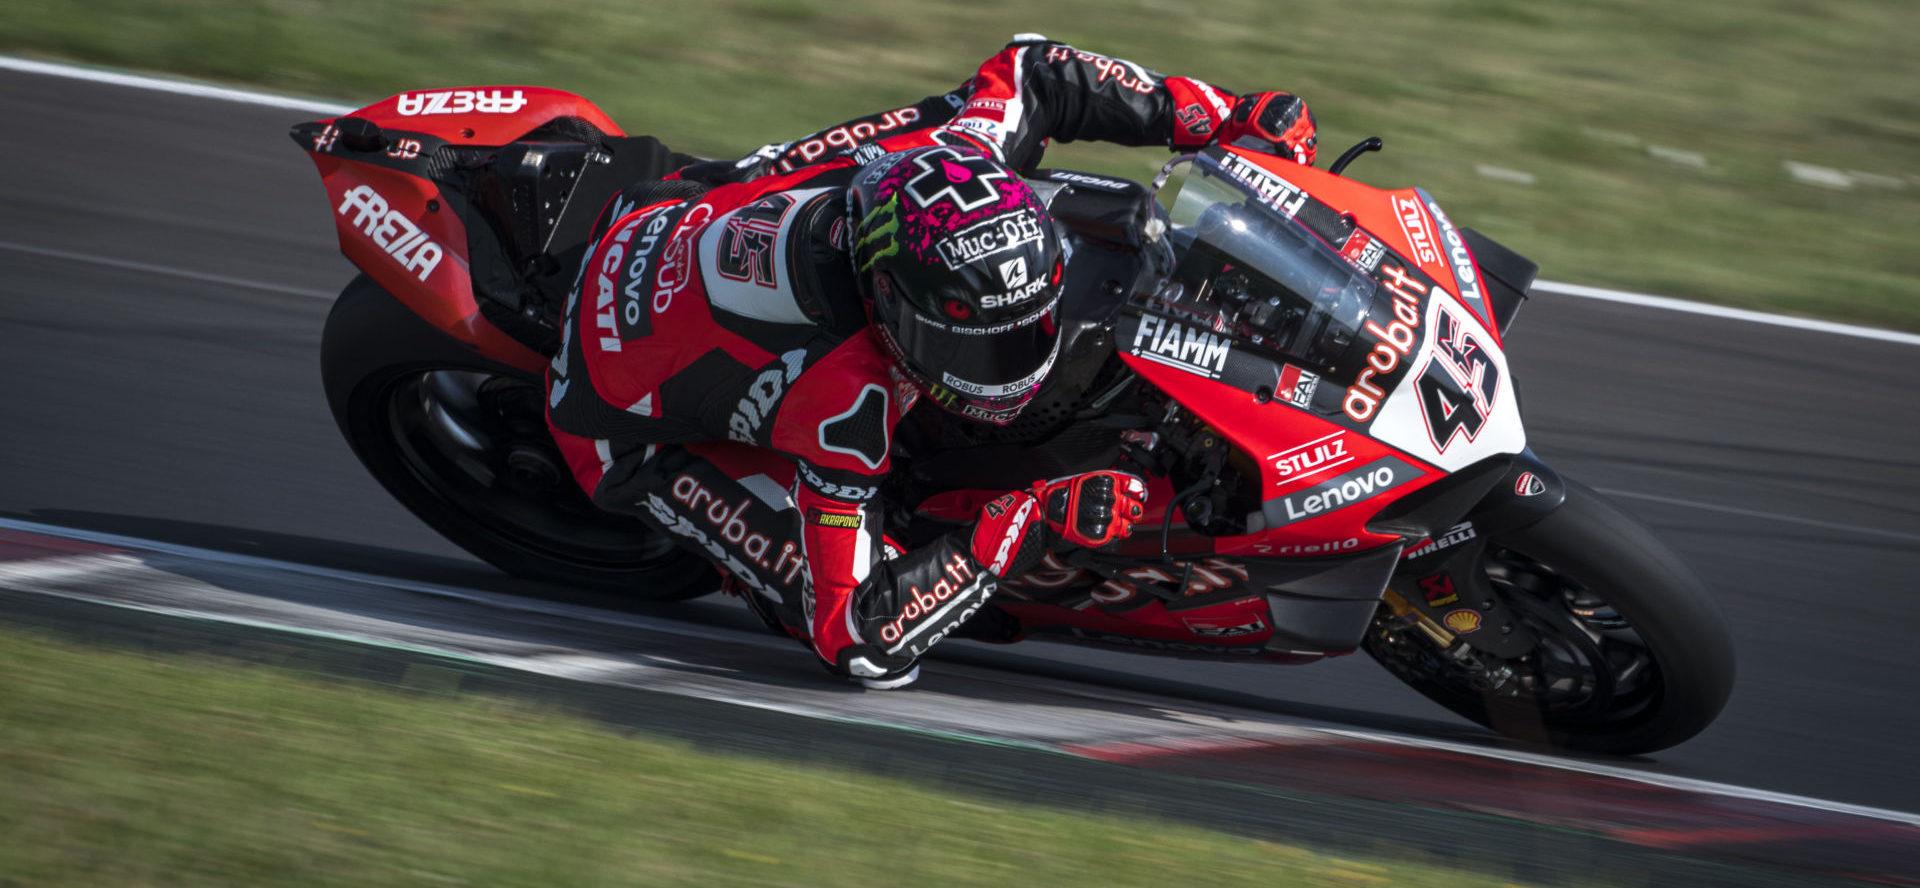 Scott Redding (45) at speed at Misano. Photo courtesy Ducati.